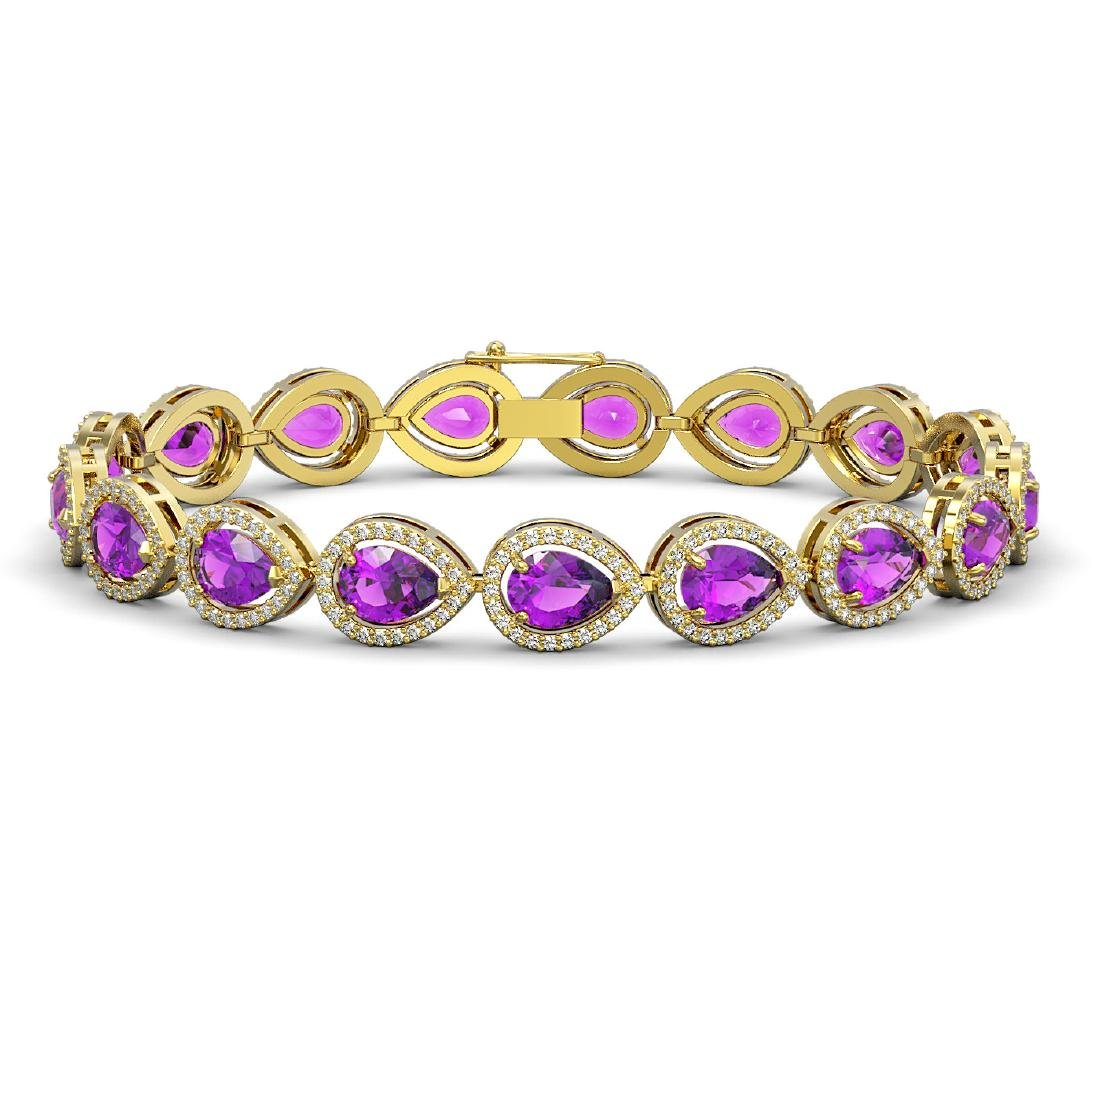 16.76 CTW Amethyst & Diamond Halo Bracelet 10K Yellow